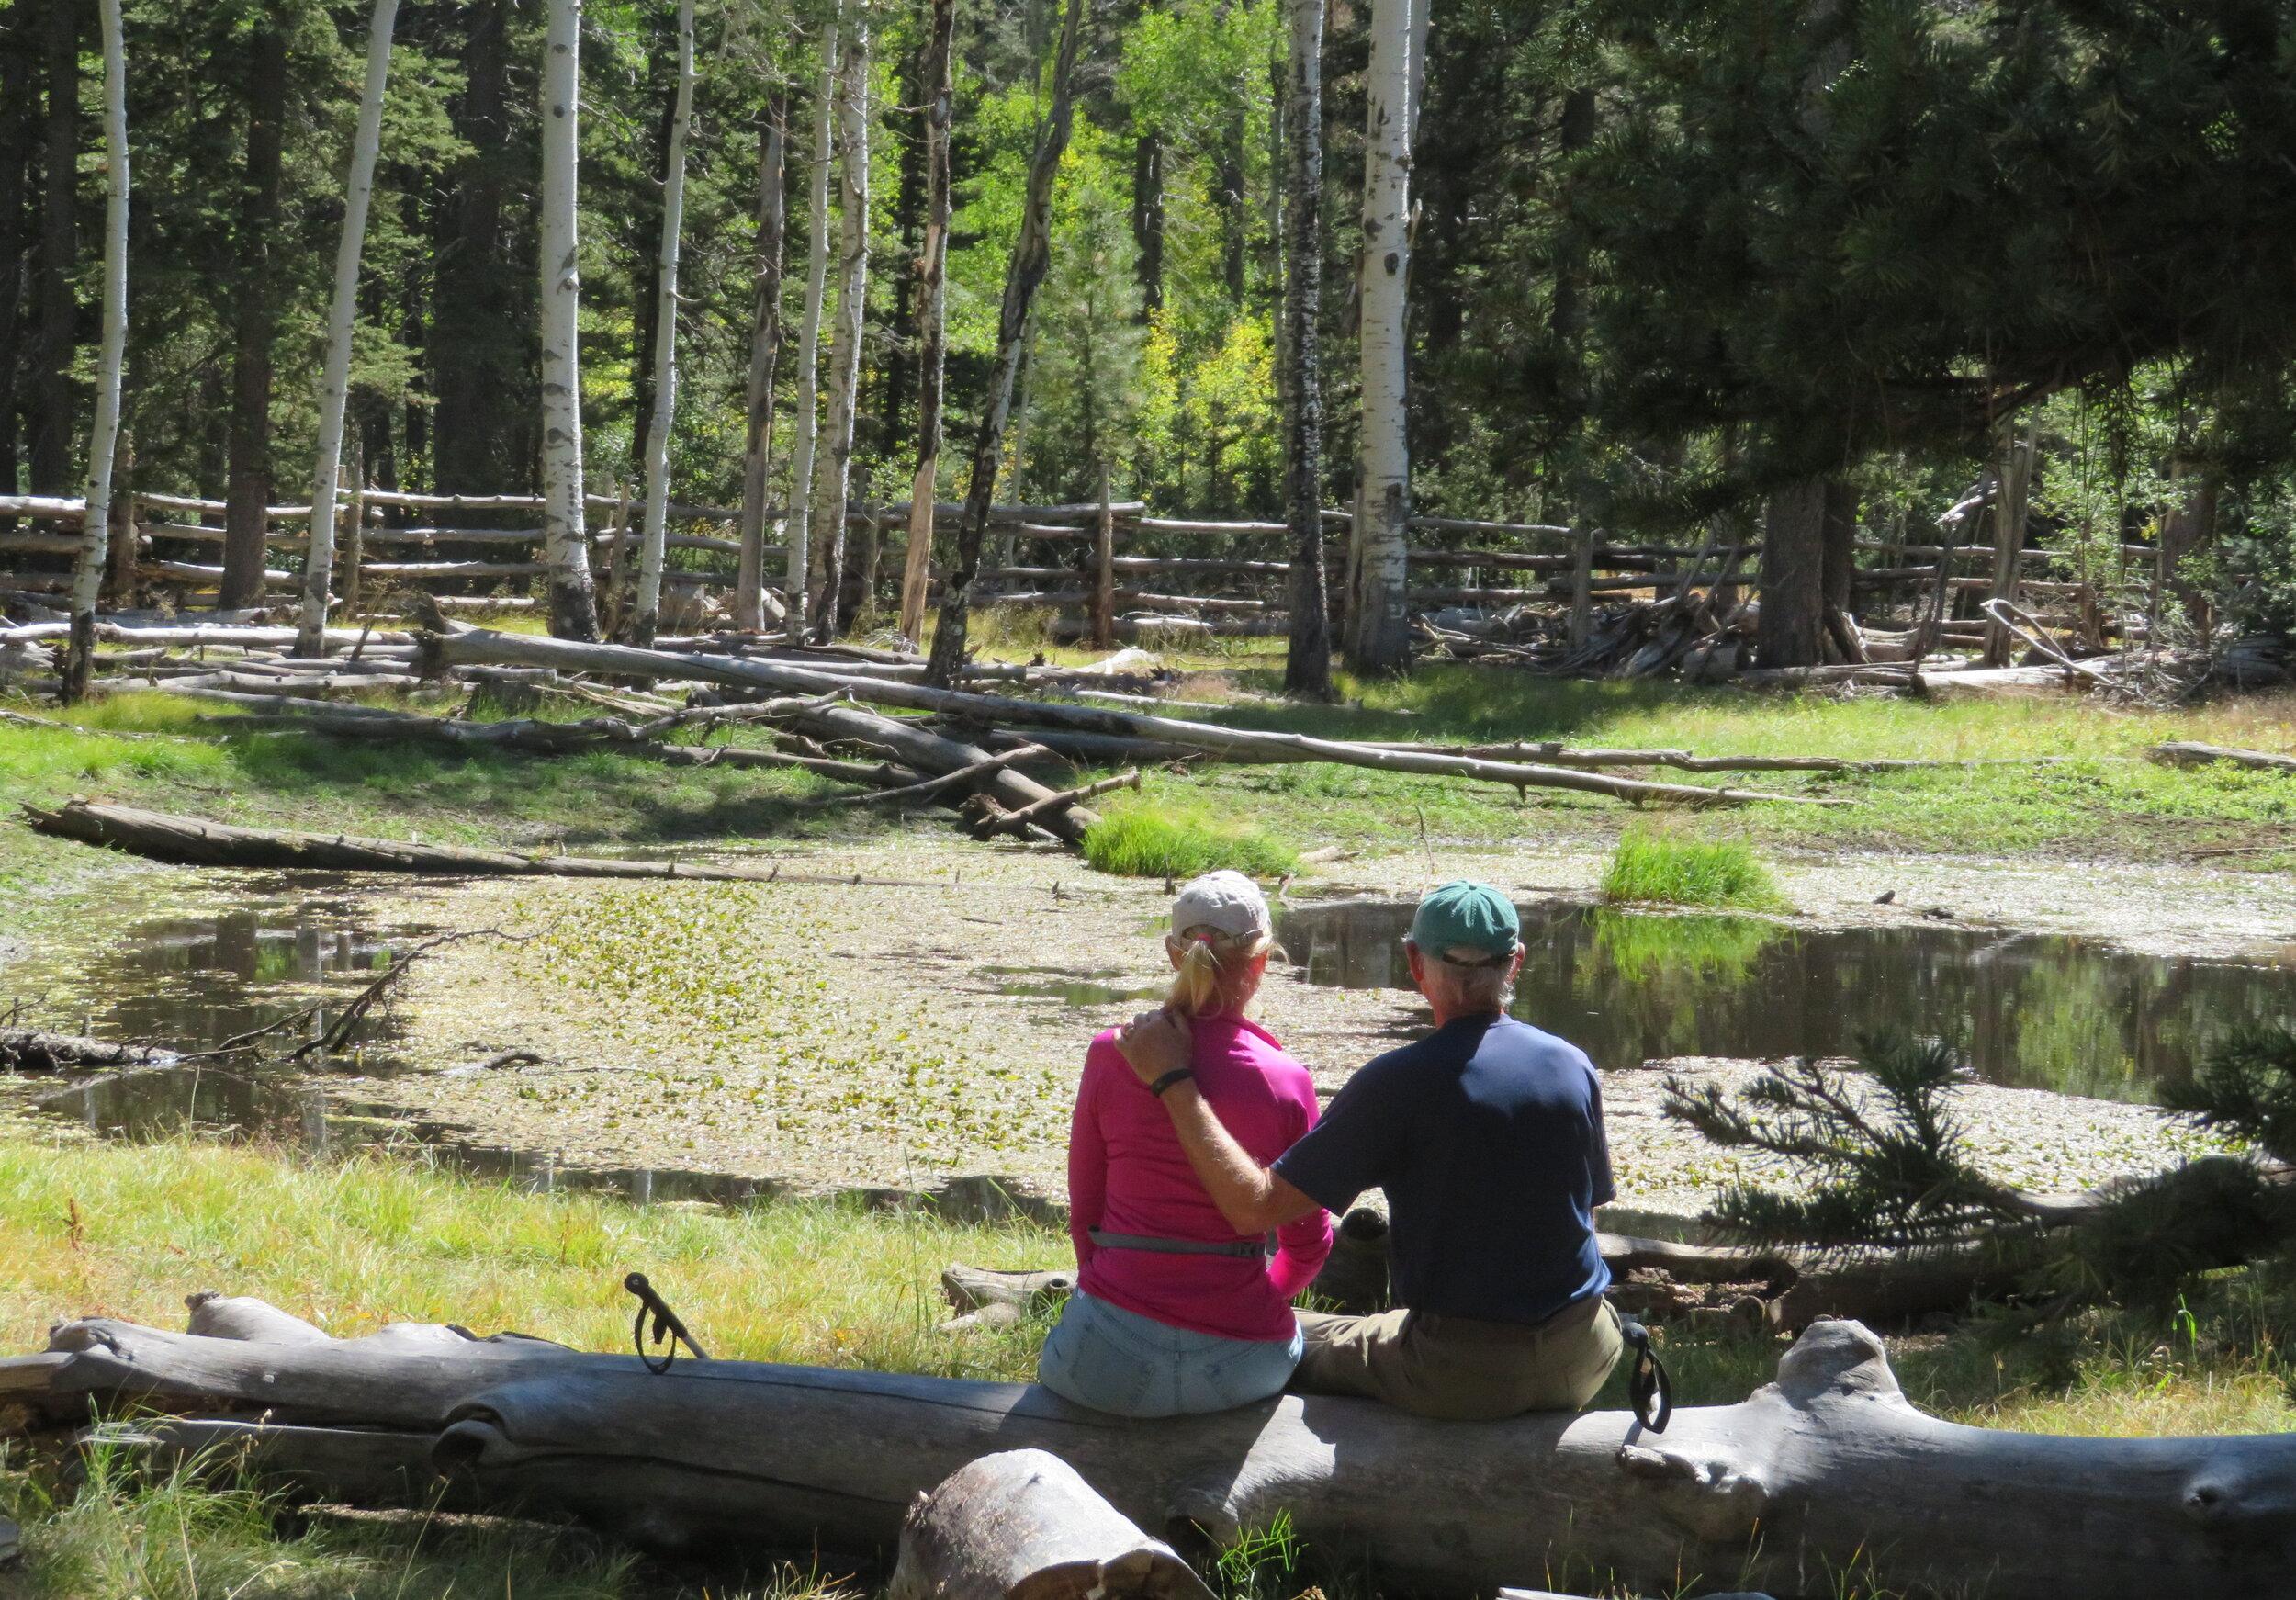 A short break at Dog Pond